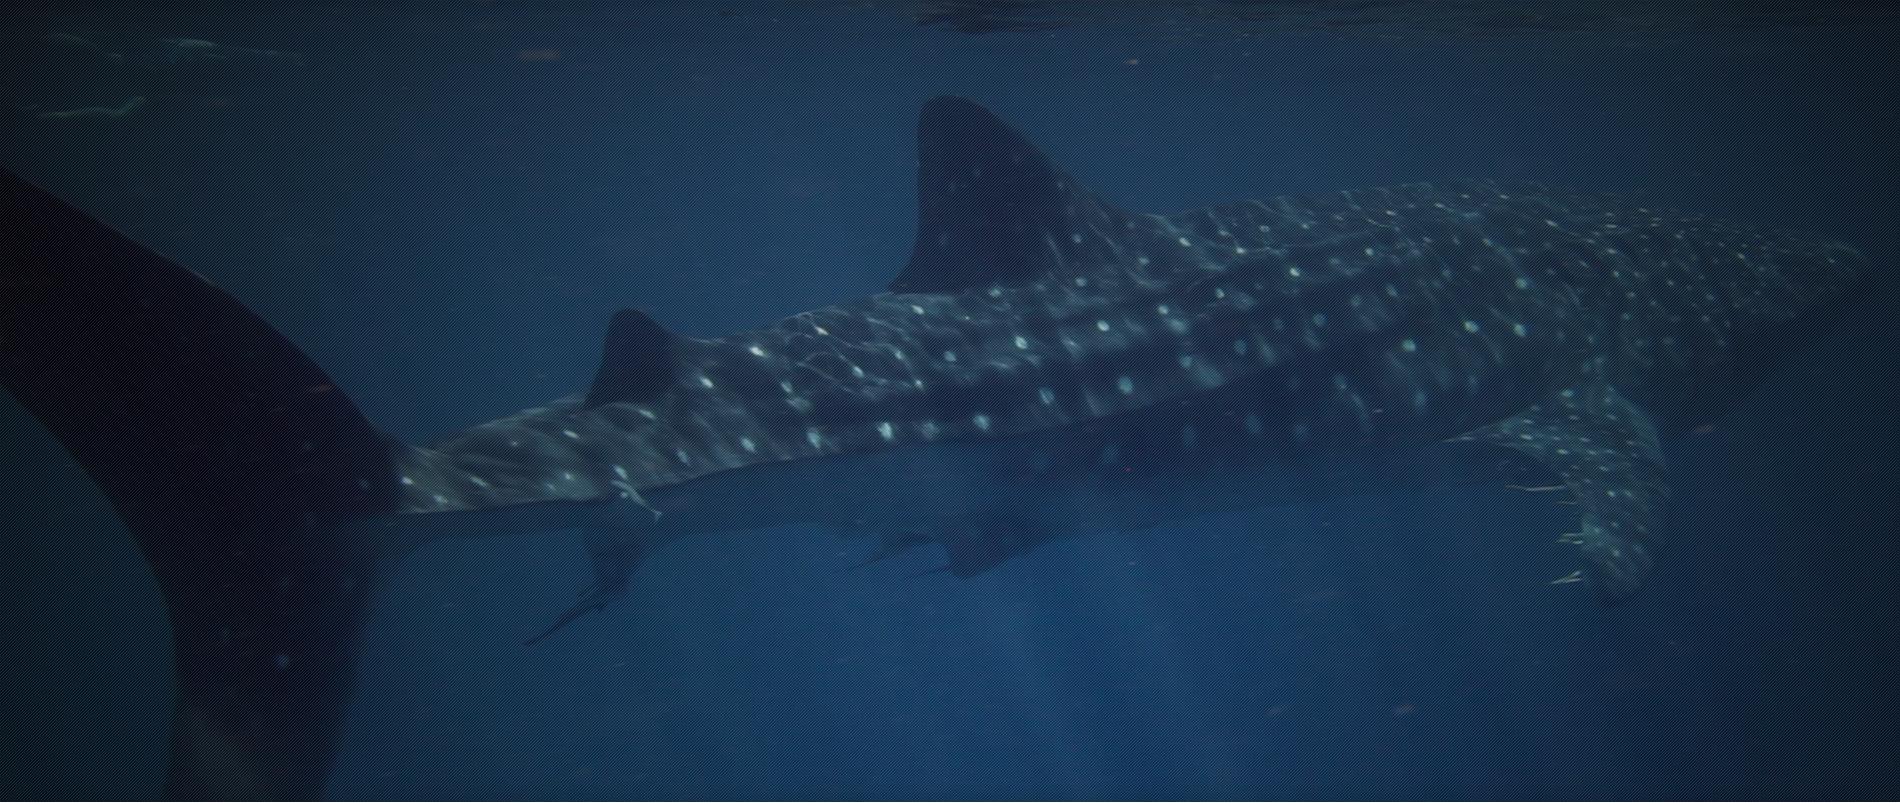 3 Island whale shark dive